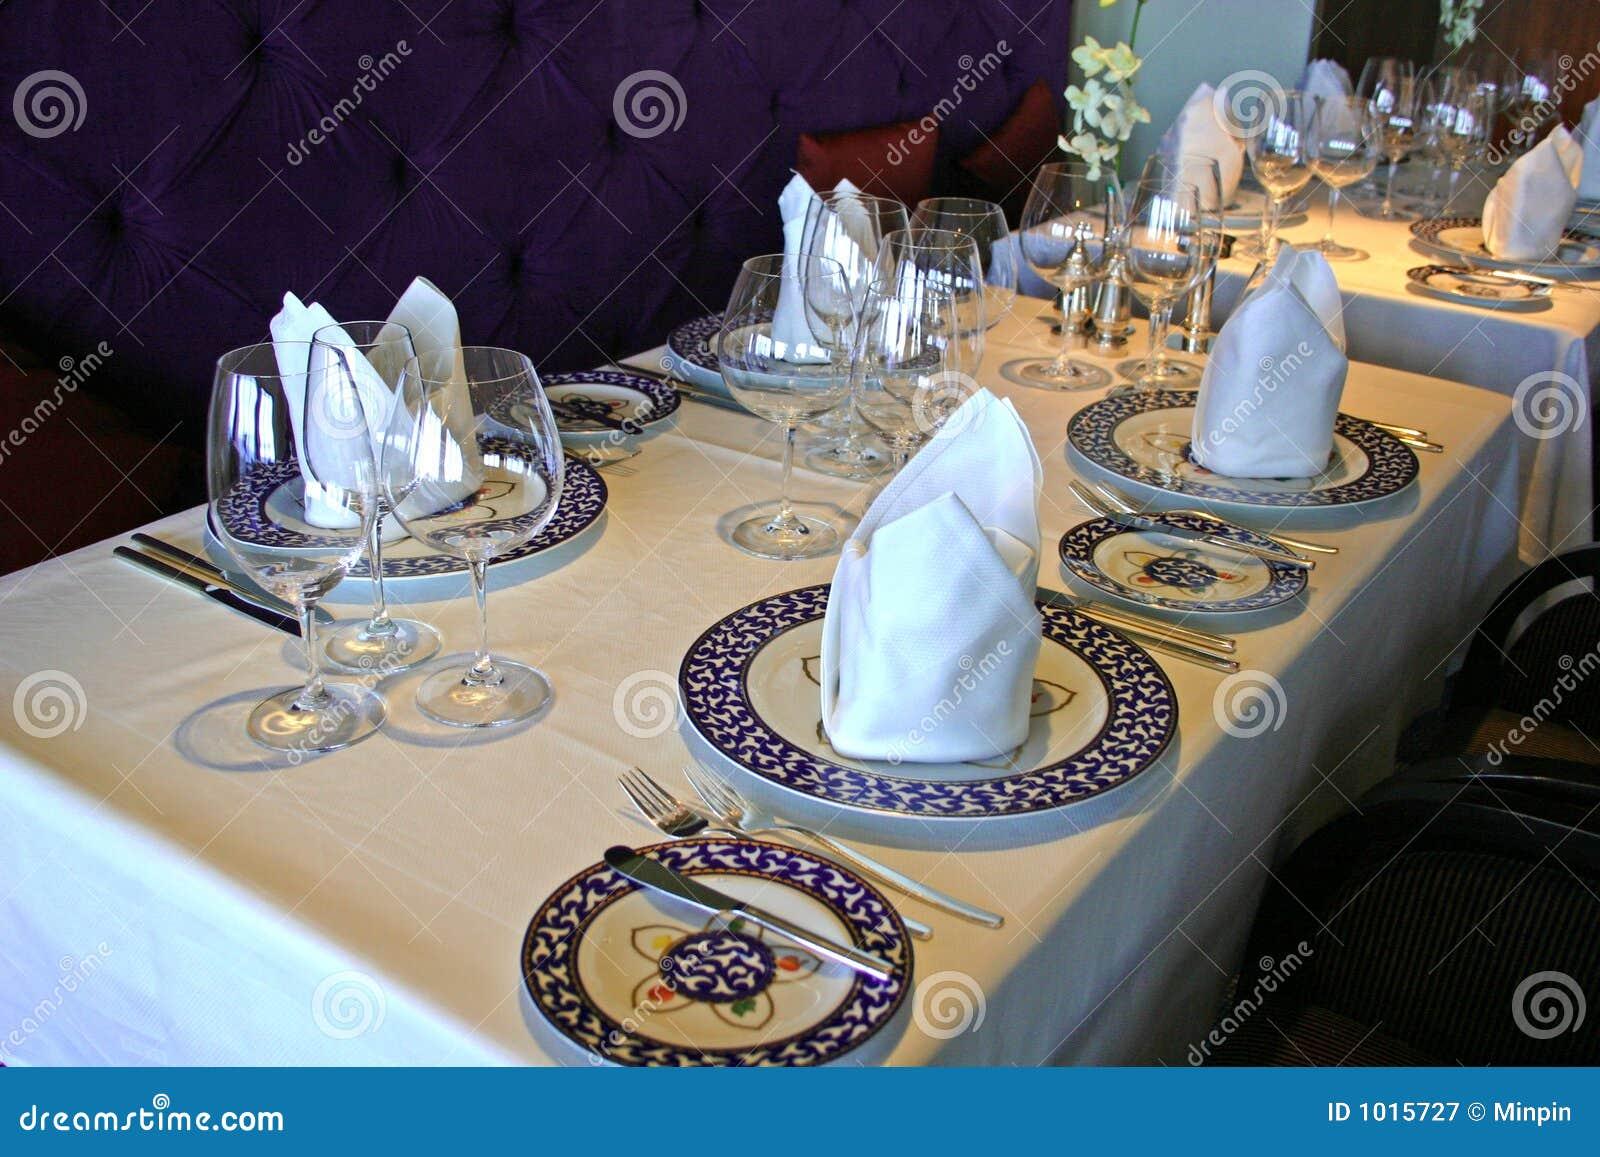 dinner cruise business plan